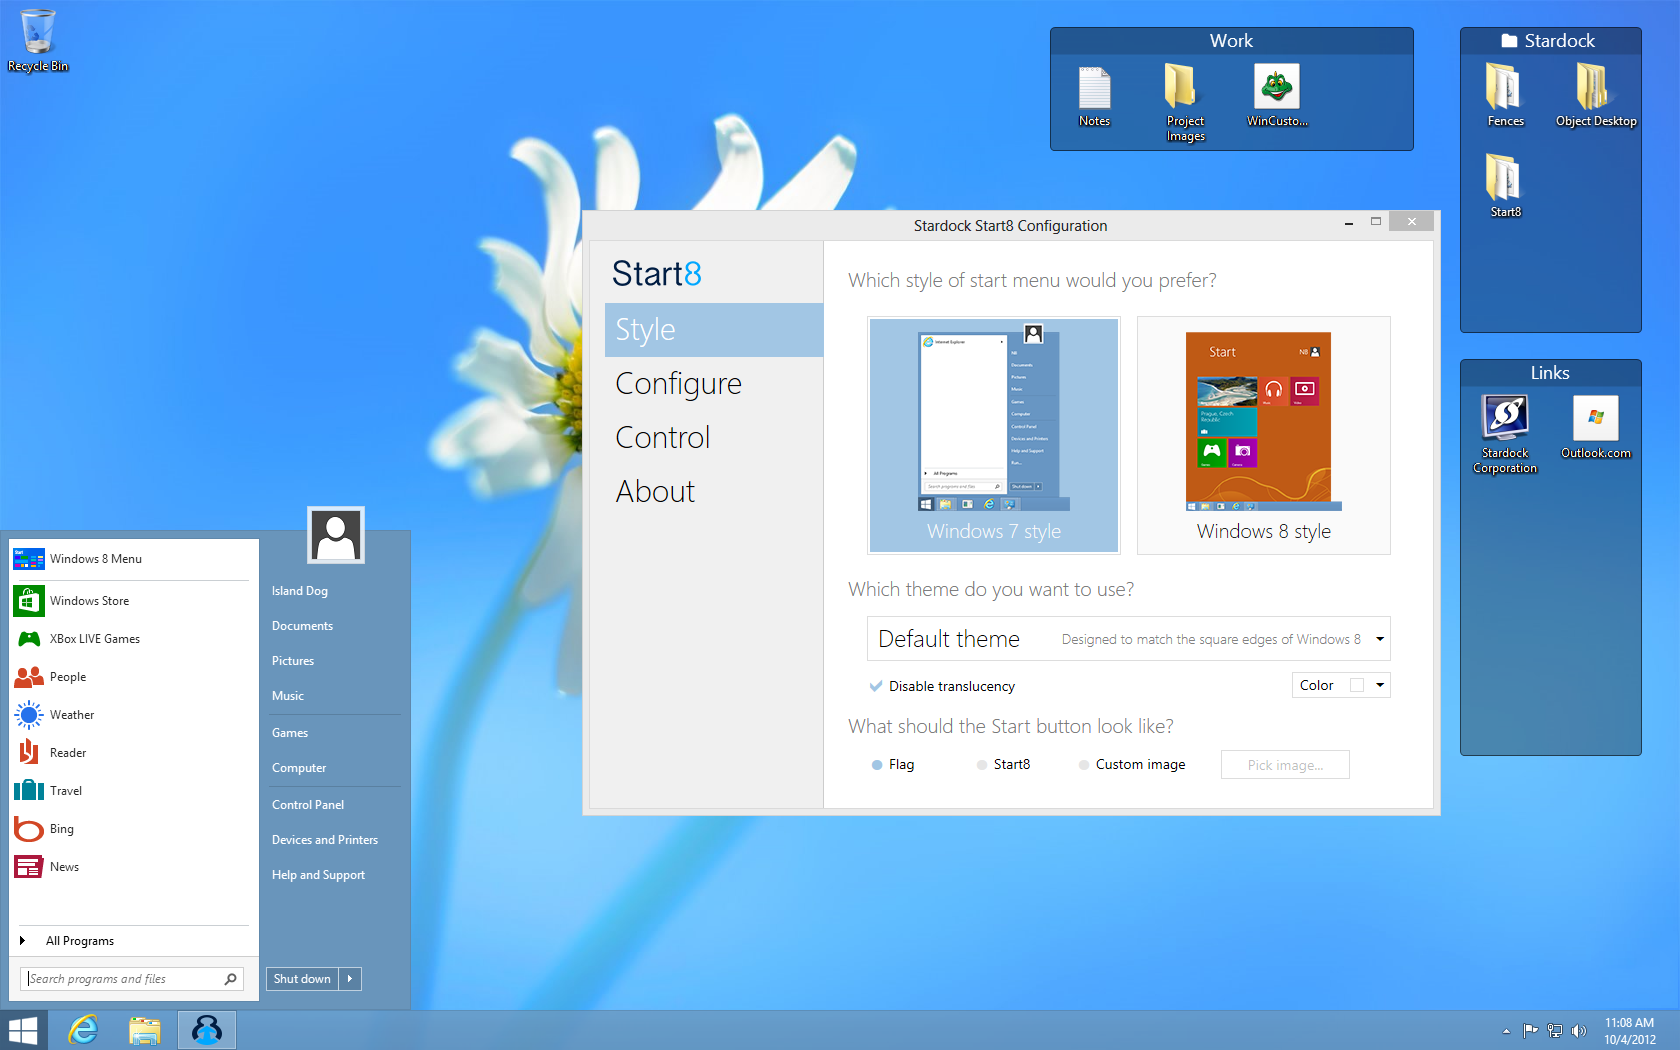 StarDock Fences 3.0.9.11 Crack For Windows Product Code Free